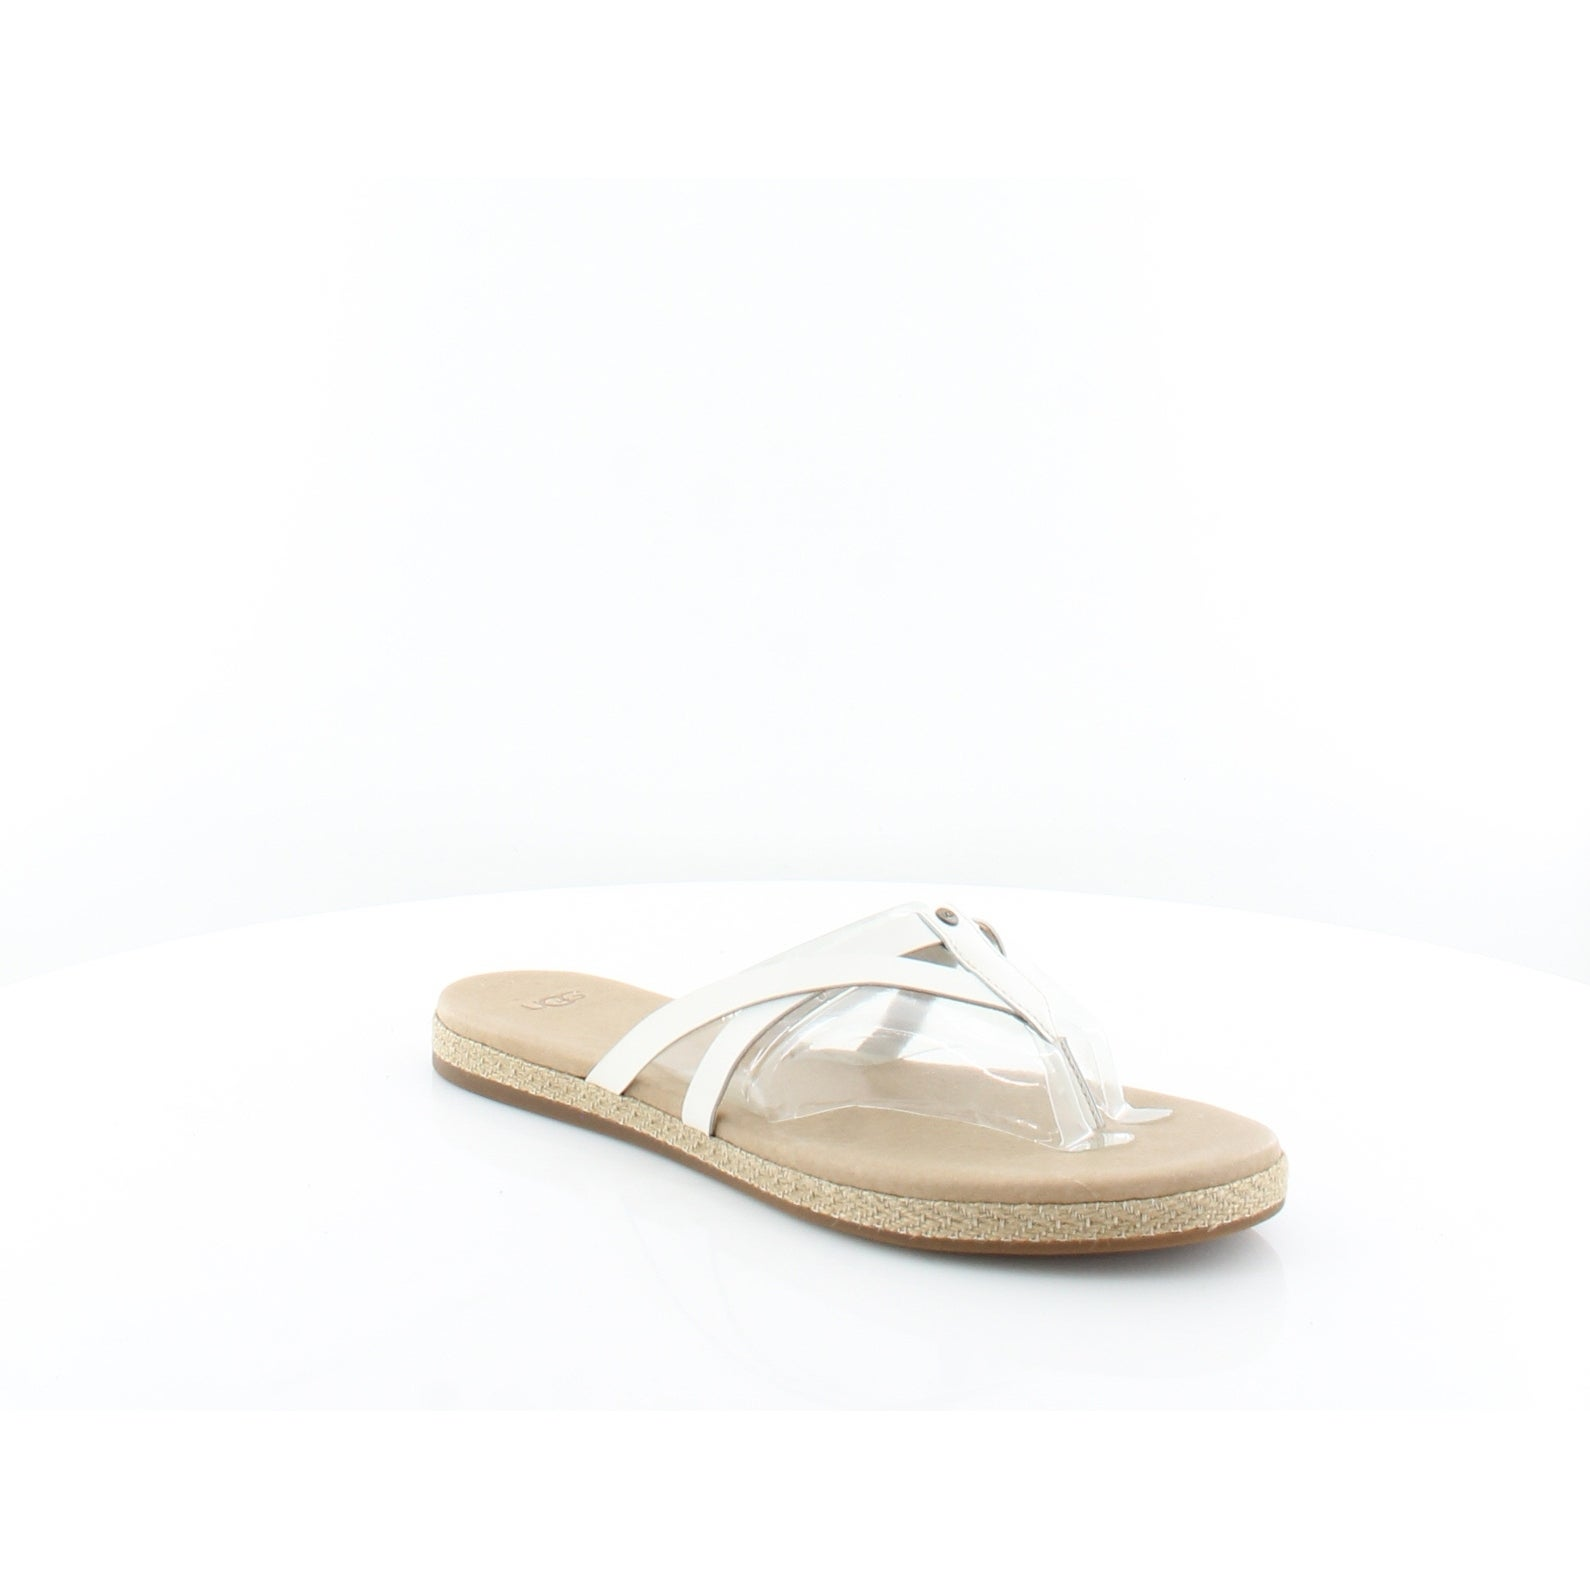 f3c61747fe3 Buy White Women s Sandals Online at Overstock